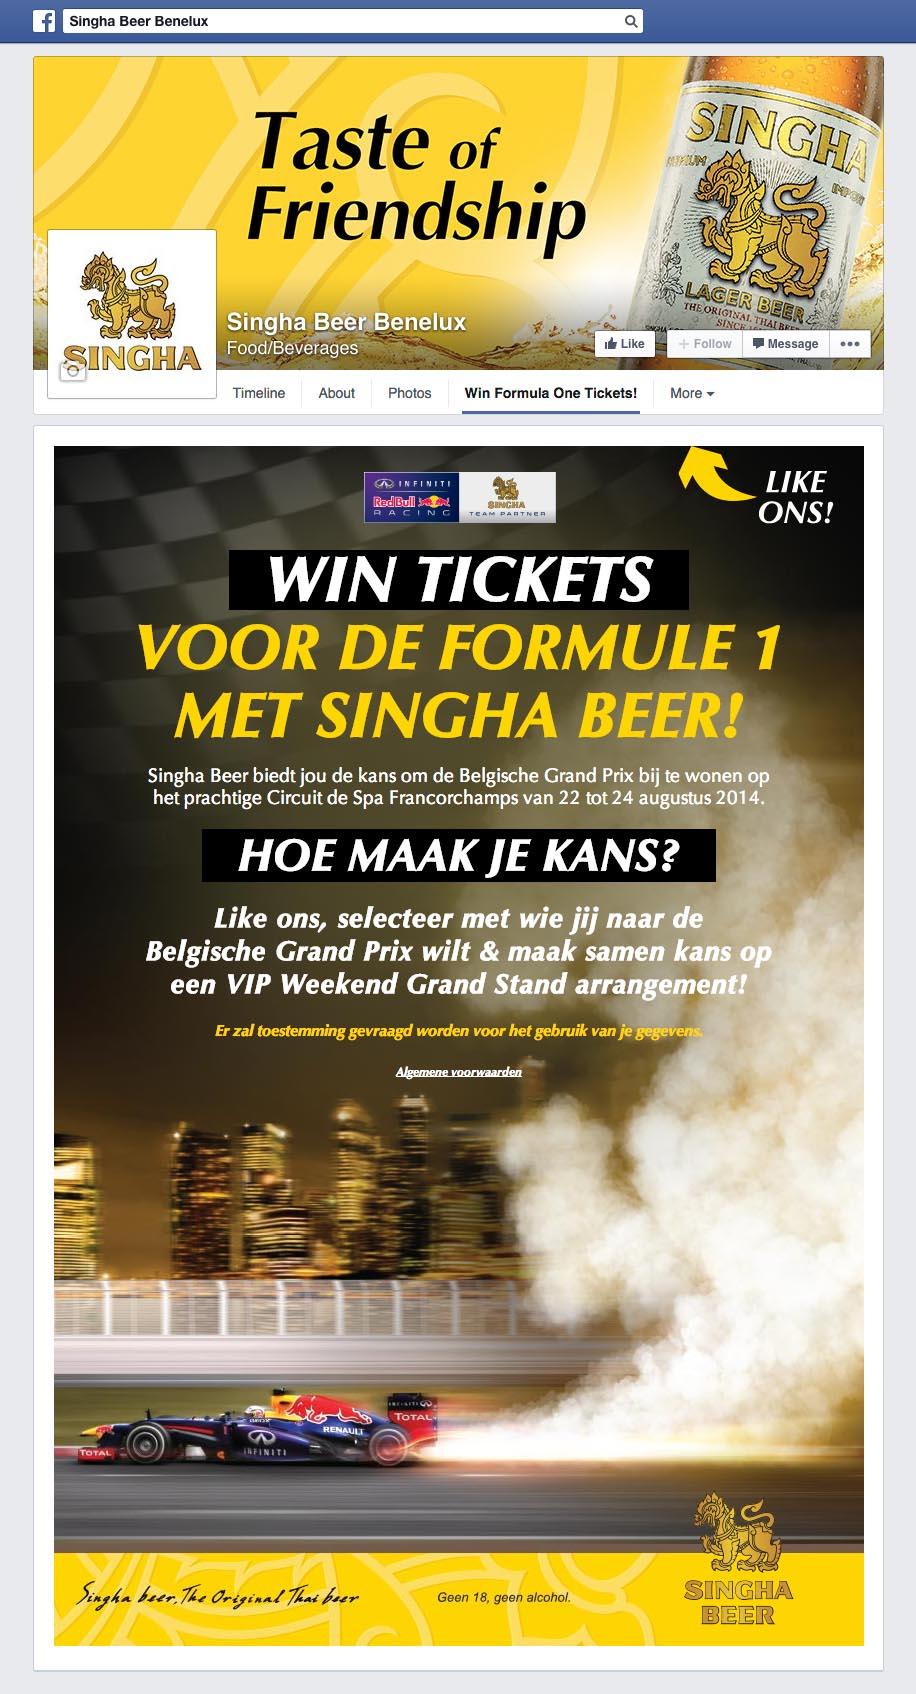 Singha Beer Benelux - Redbull Racing Facebook app